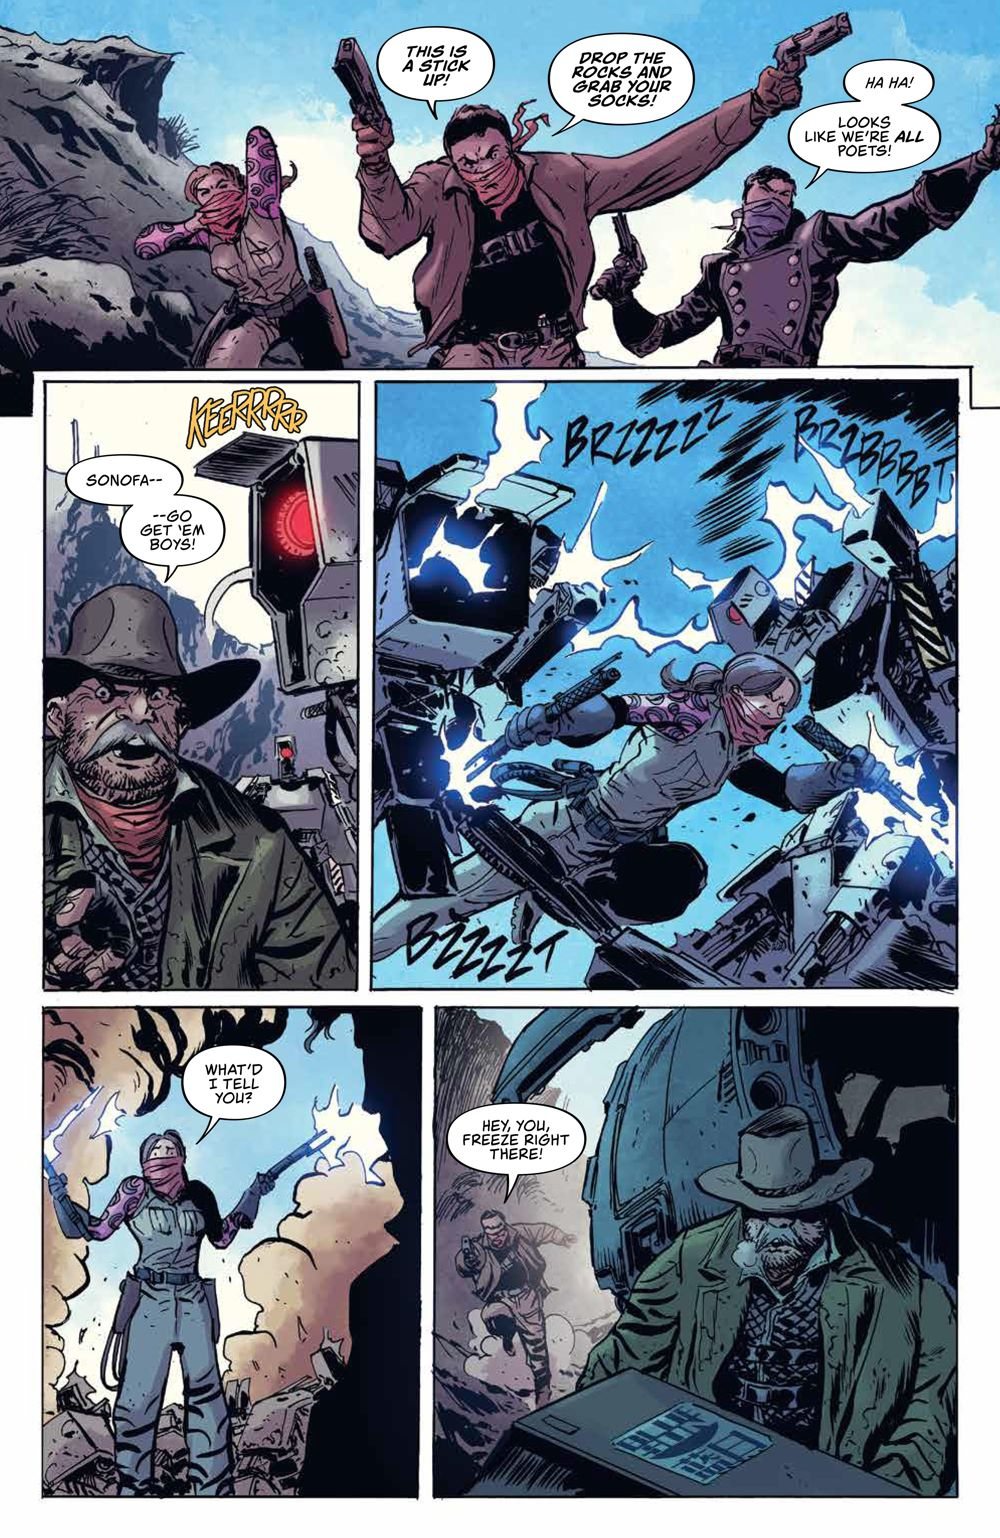 Firefly_BlueSunRising_v1_HC_PRESS_12 ComicList Previews: FIREFLY BLUE SUN RISING VOLUME 1 HC